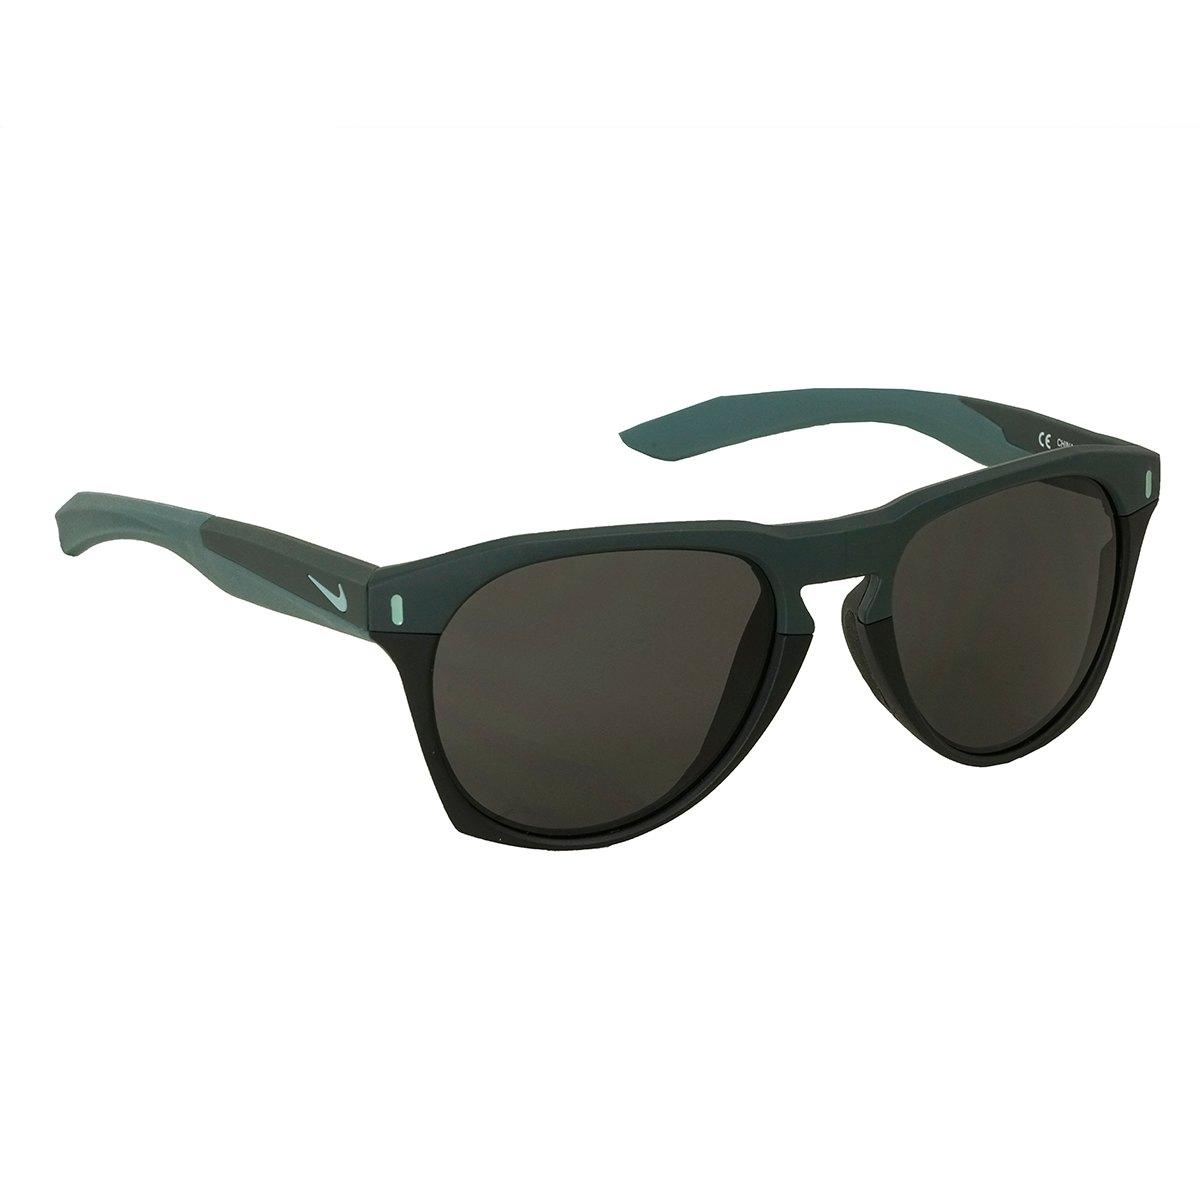 Nike Navigator Sunglasses (Two Colors): $43.99 AC + Free Shipping